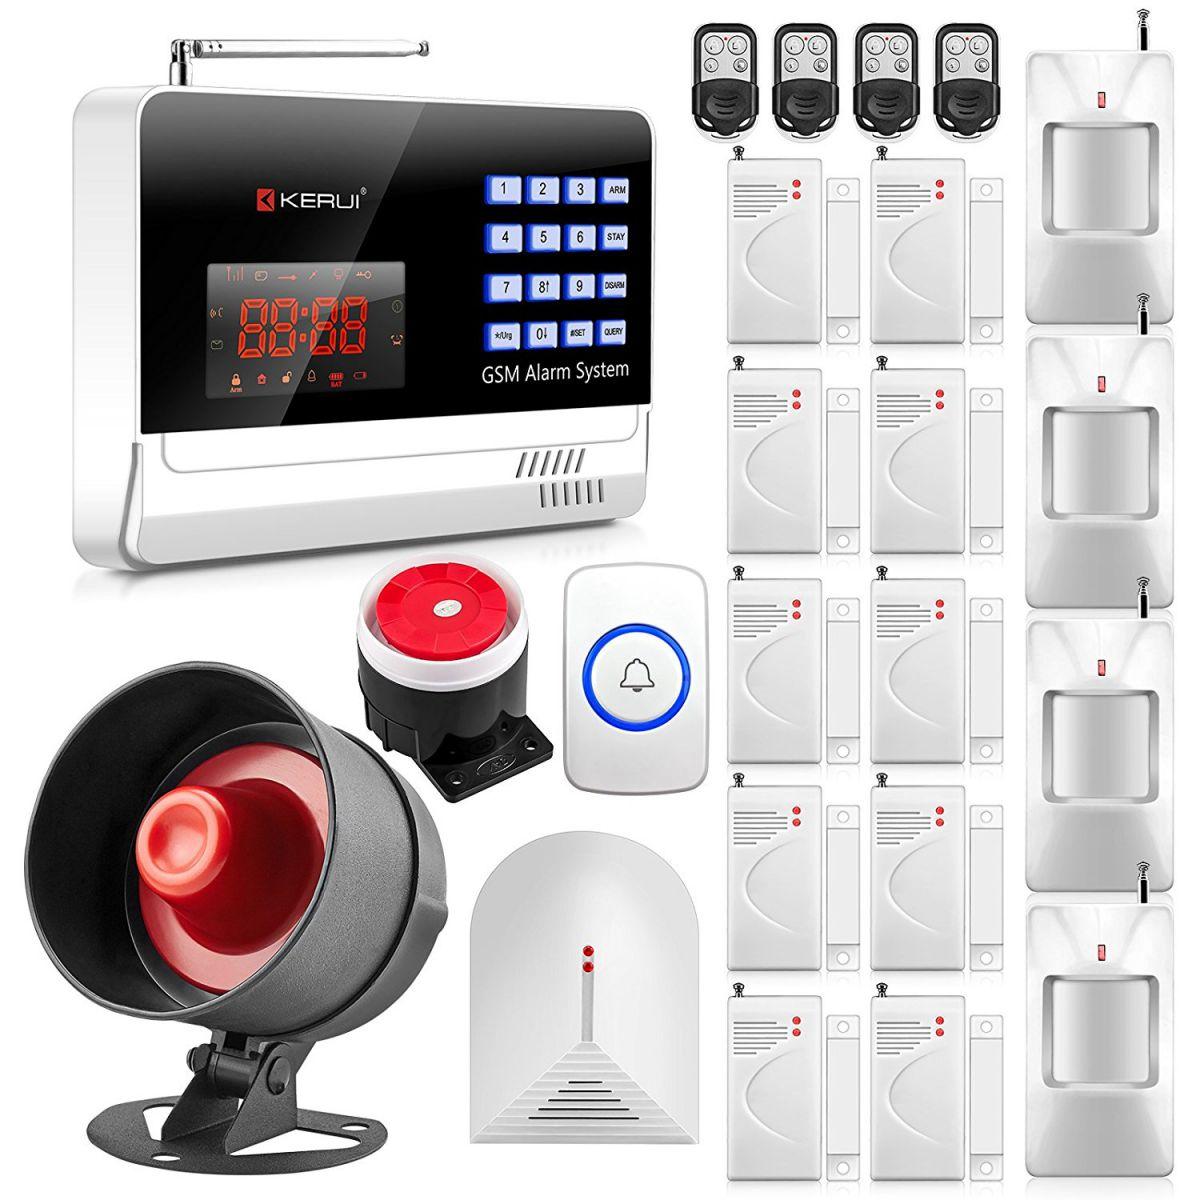 KERUI-N6120G-Wireless-GSM-Home-Security-Burglar-Alarm-System-Kit